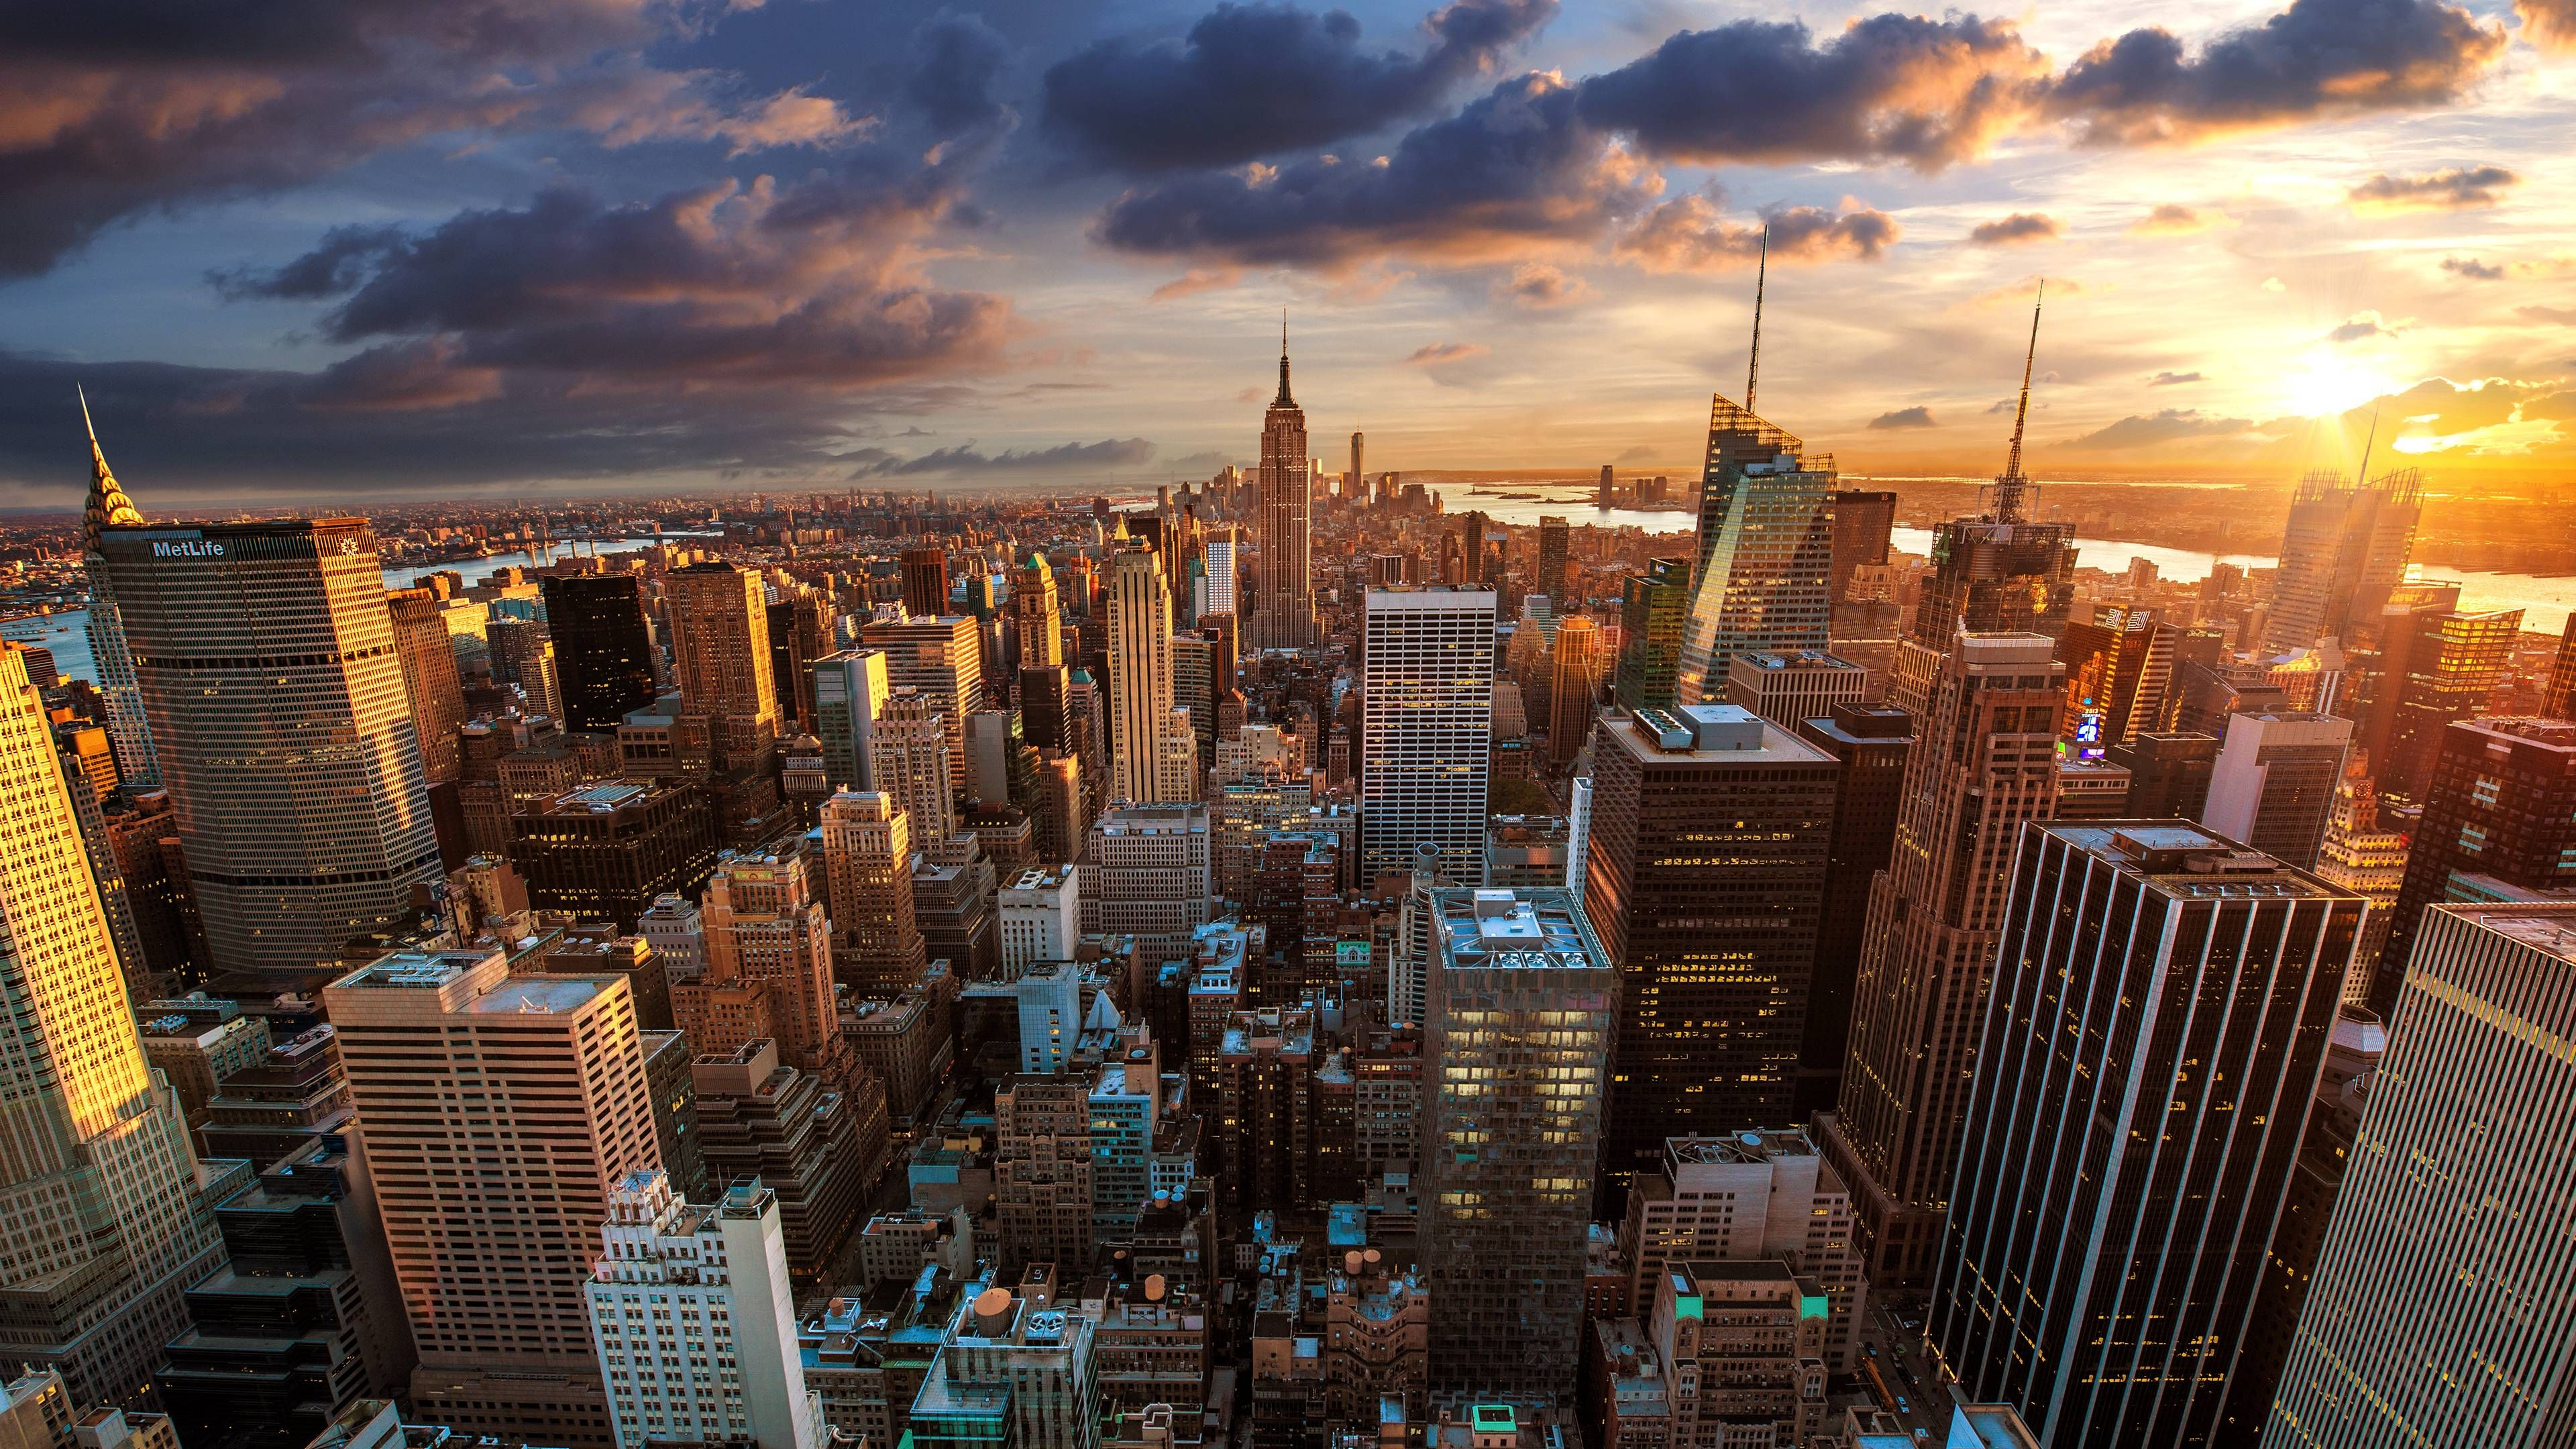 New York City 3840x2160 R Wallpapers New York Wallpaper New York City Background City Wallpaper